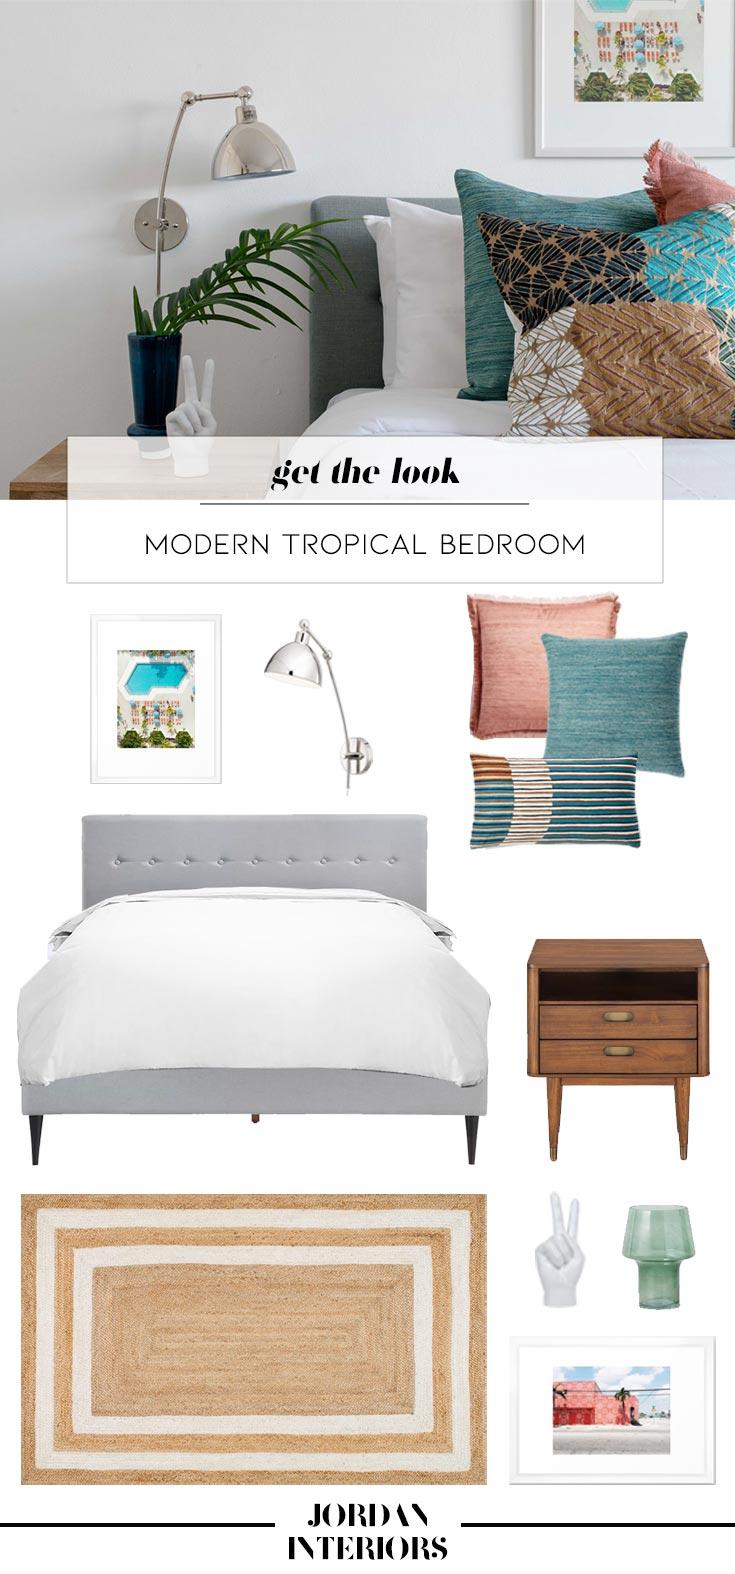 Modern Tropical Miami Bedroom - Get The Look  // Jordan Interiors